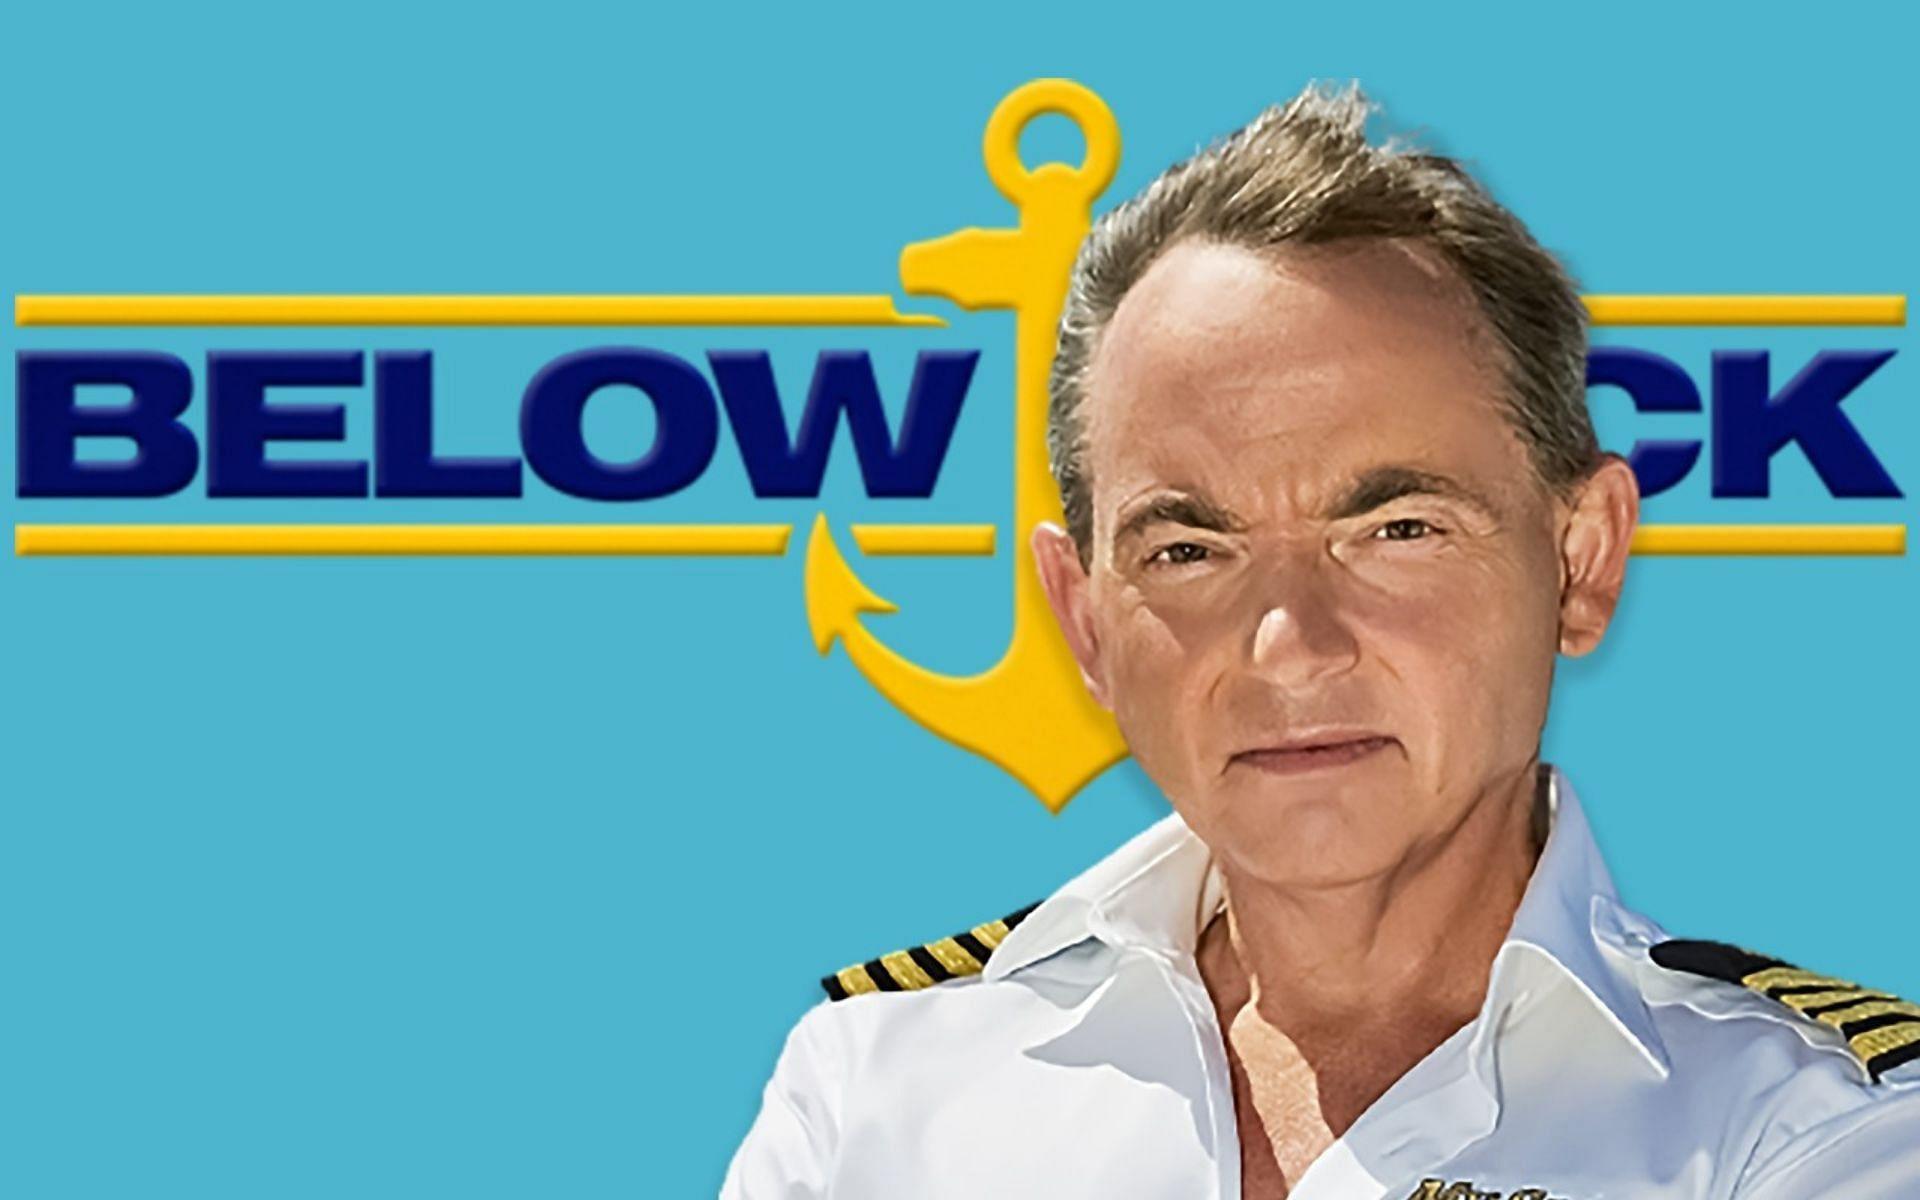 'Below Deck' Season 9 new captain Sean Meagher (Image via Sportskeeda)